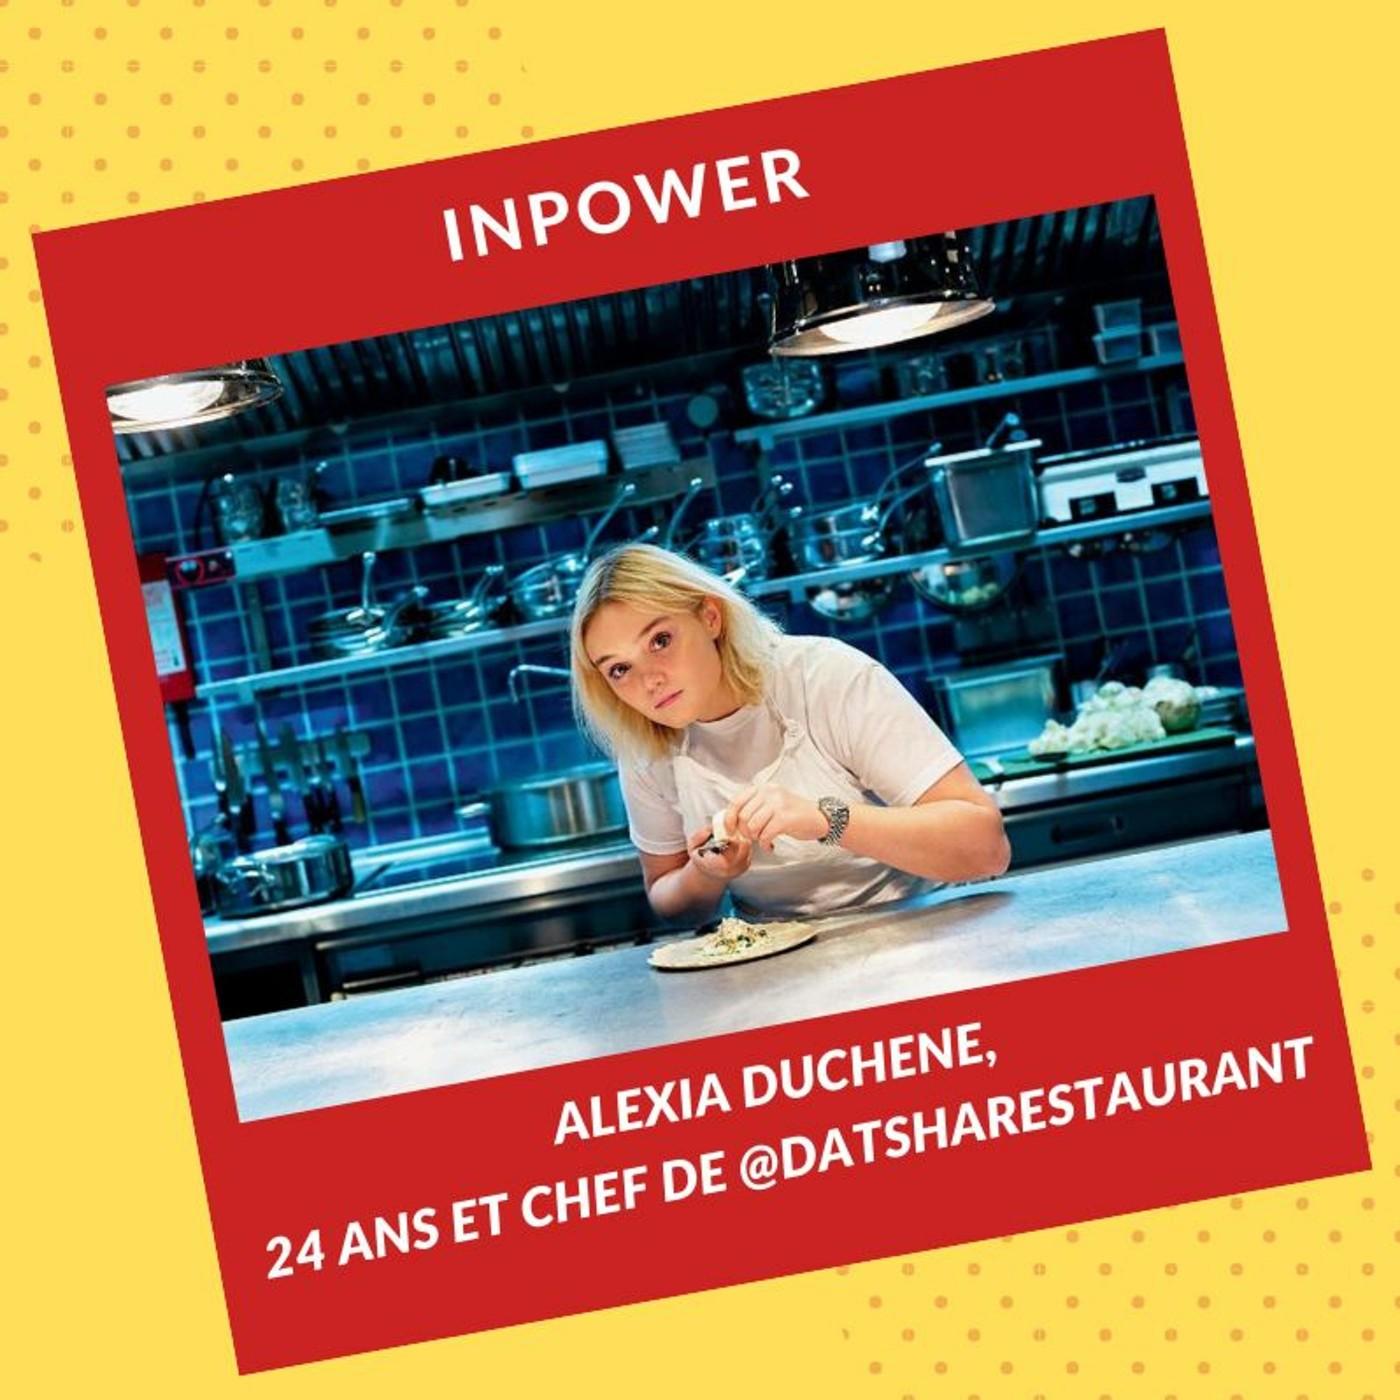 Alexia Duchene, 24 ans et Chef de @DatshaRestaurant